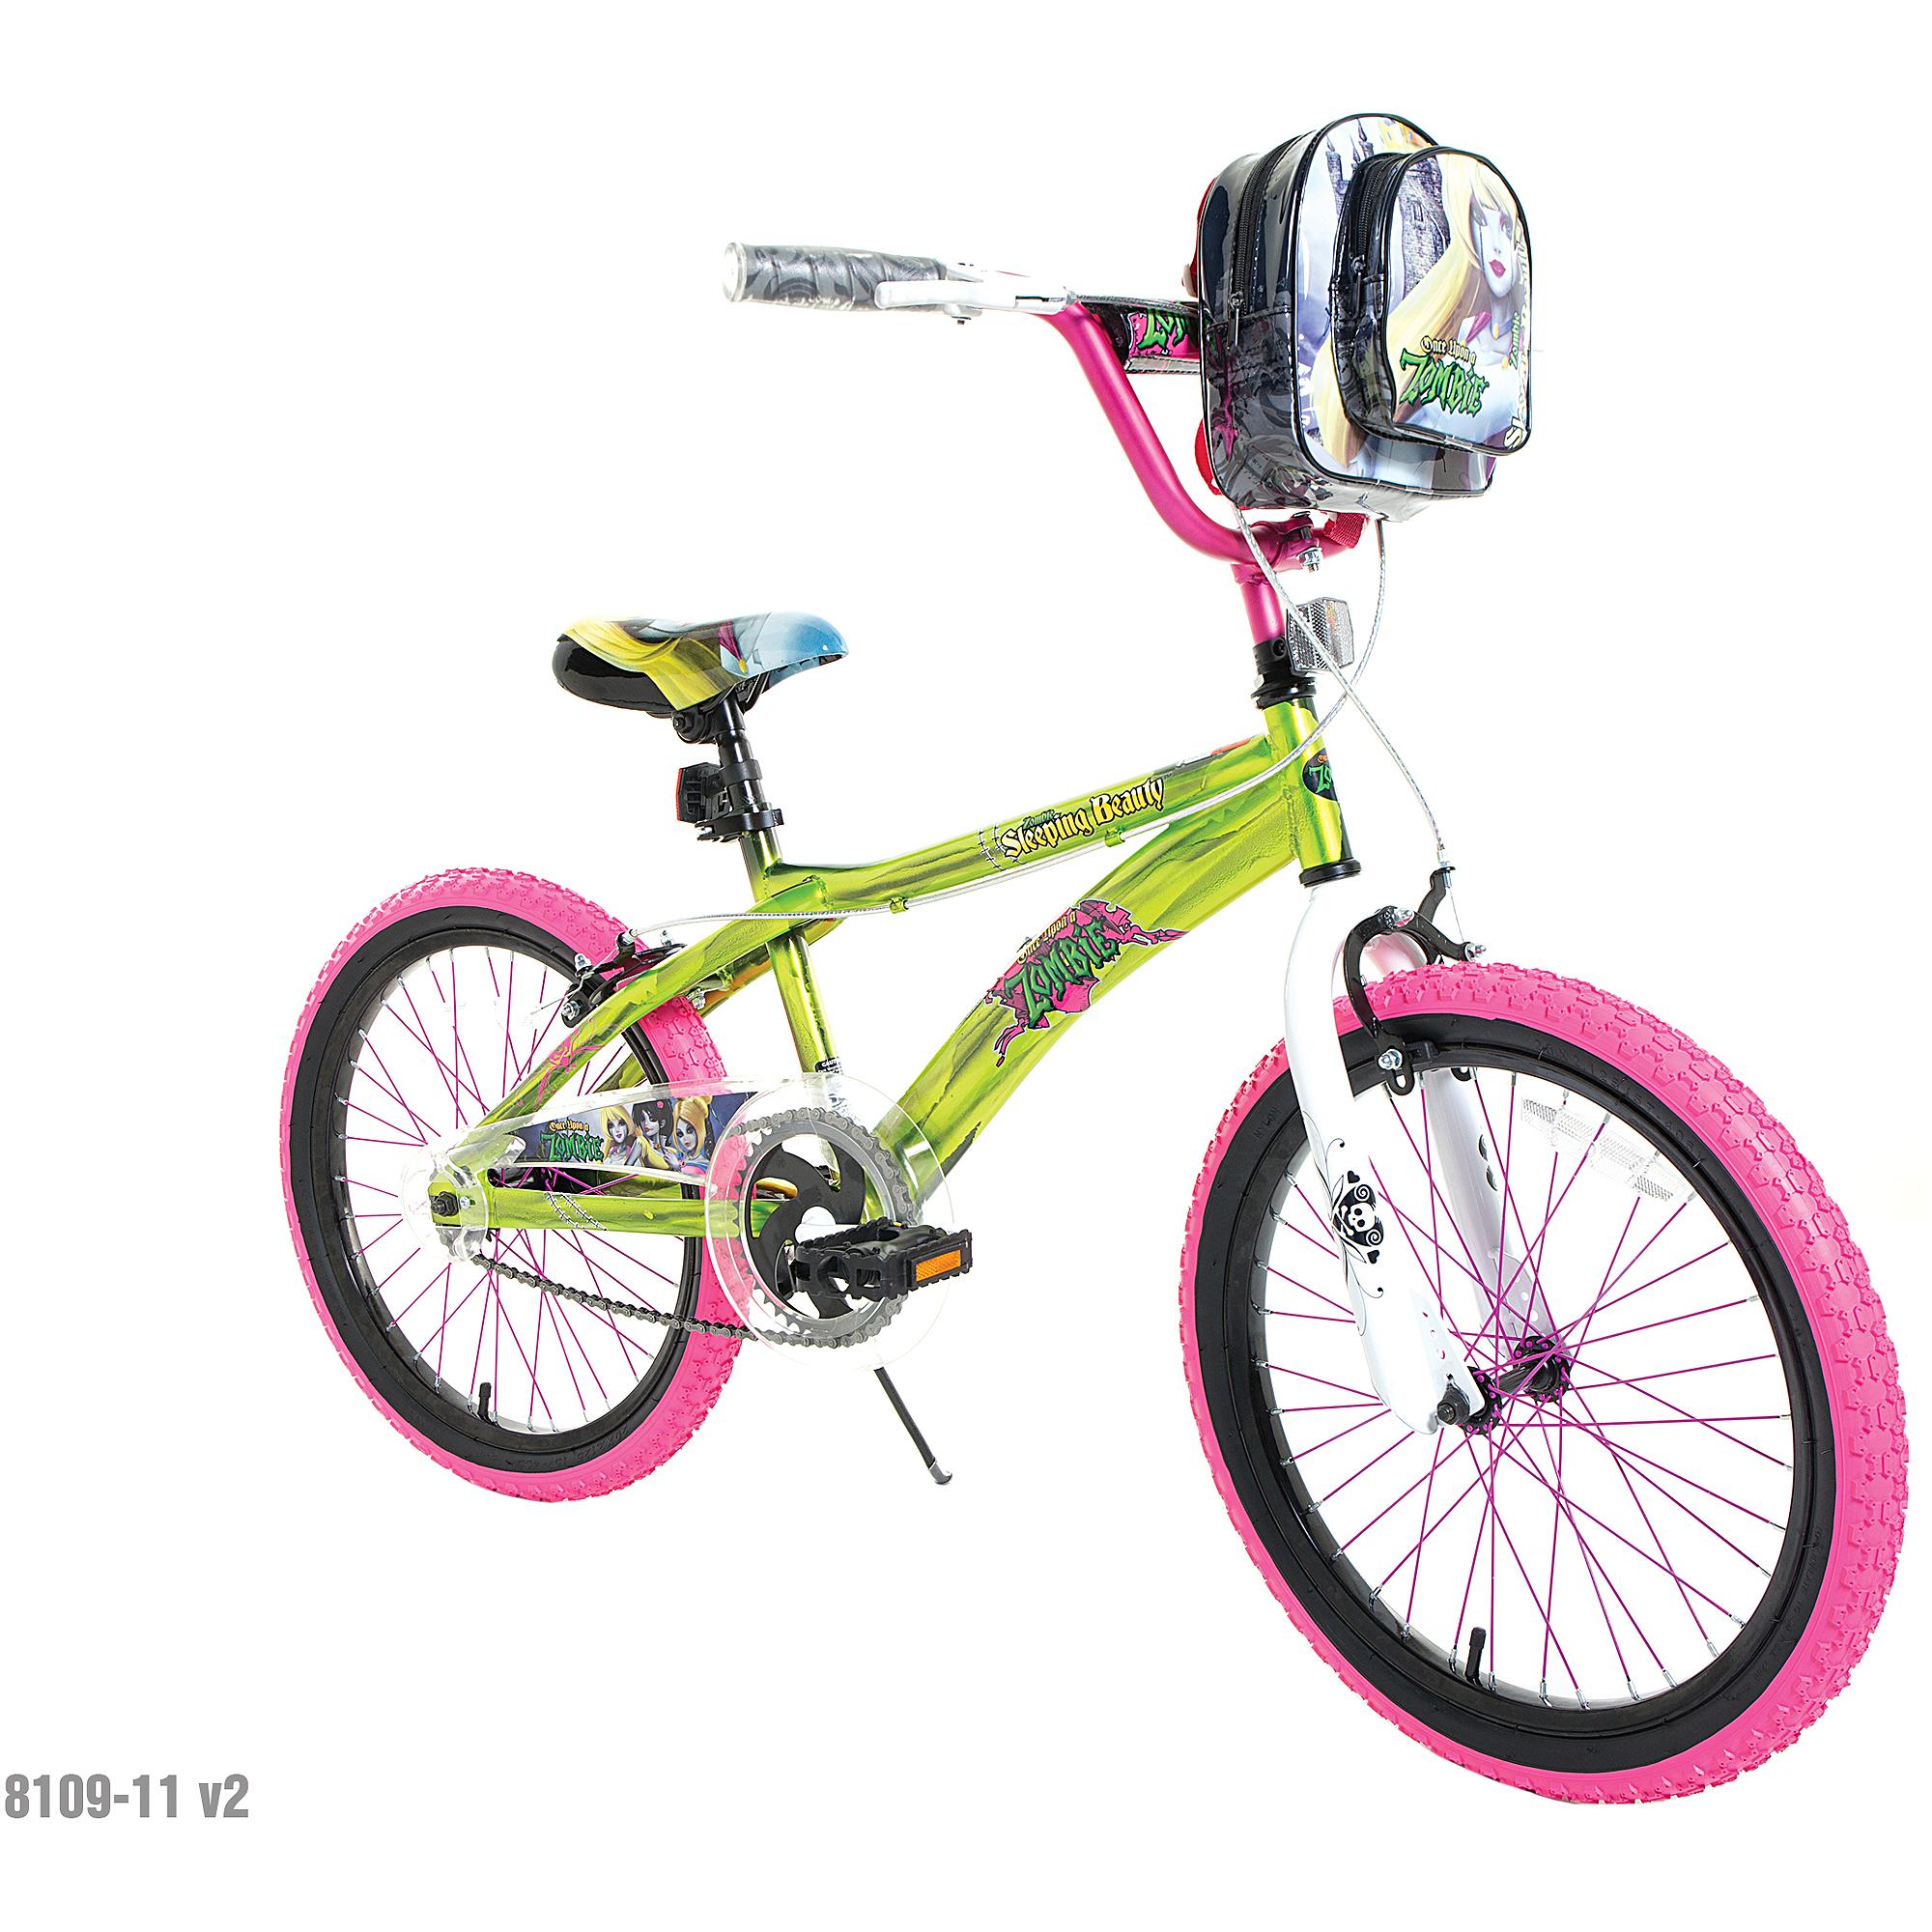 "20"" Once Upon a Zombie Sleeping Beauty Girls' Bike"